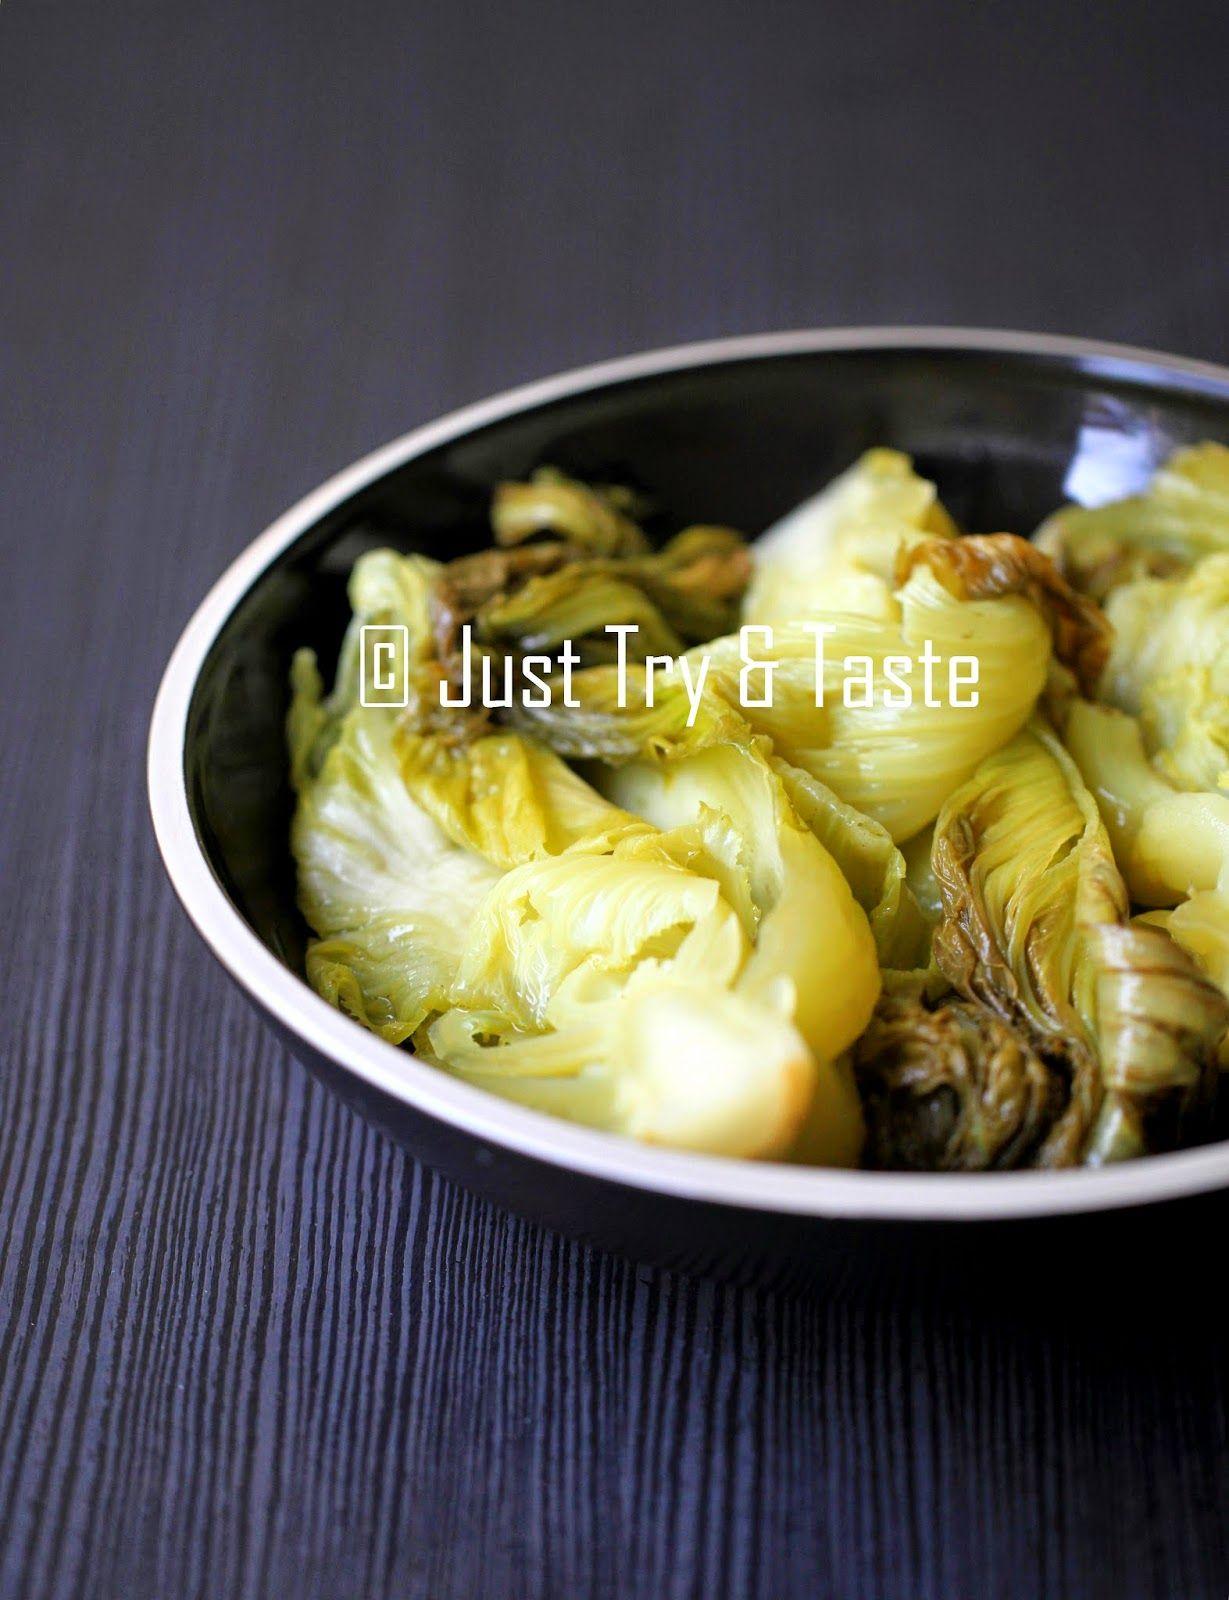 Homemade Acar Sawi Sawi Asin Masakan Indonesia Resep Masakan Asia Resep